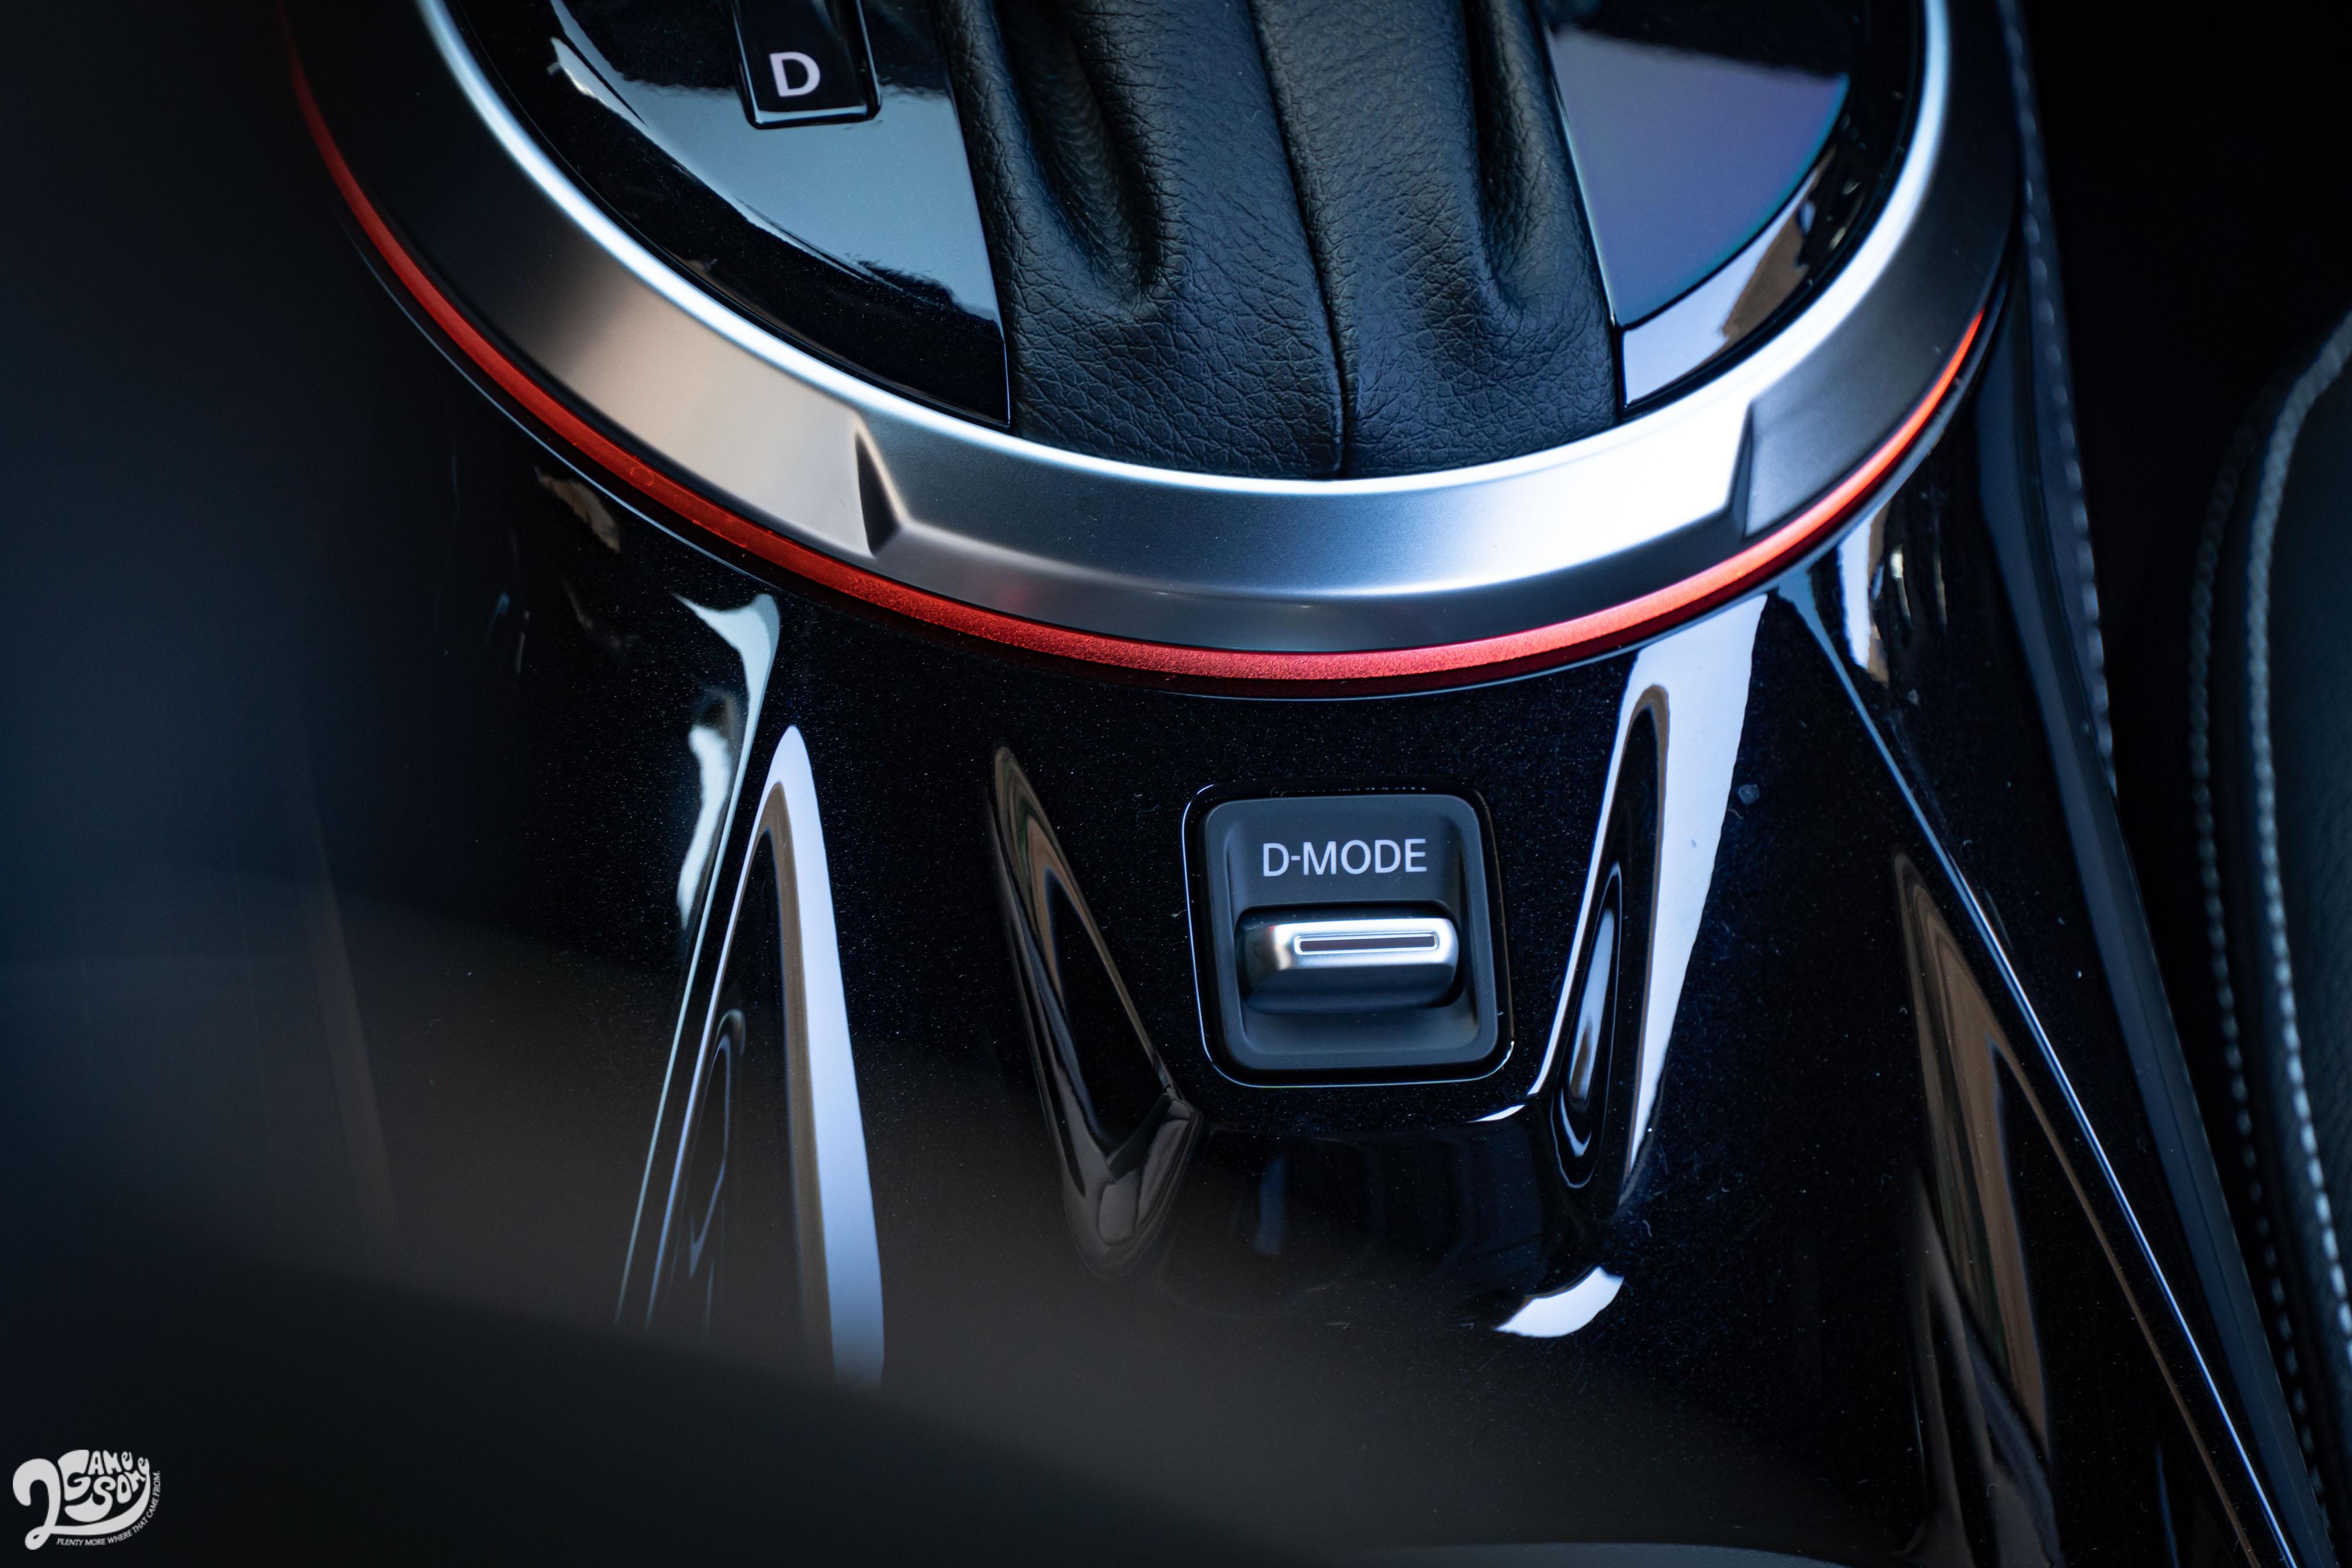 D-Mode 整合駕駛模式提供 ECO節能/ Normal一般/ Sport運動模式。